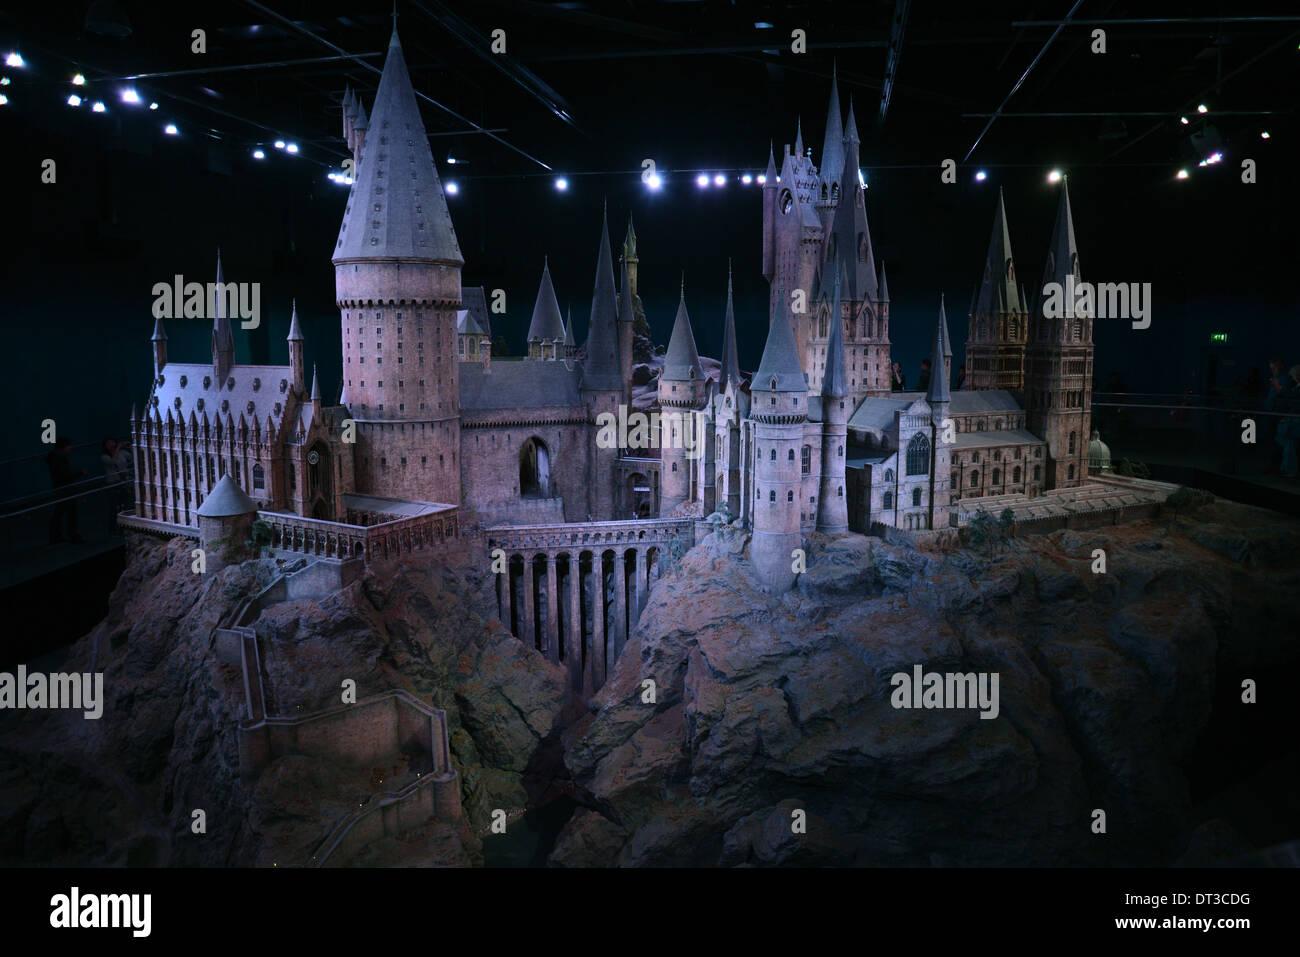 Harry Potter Studio Tour, Hogwarts castle - Stock Image